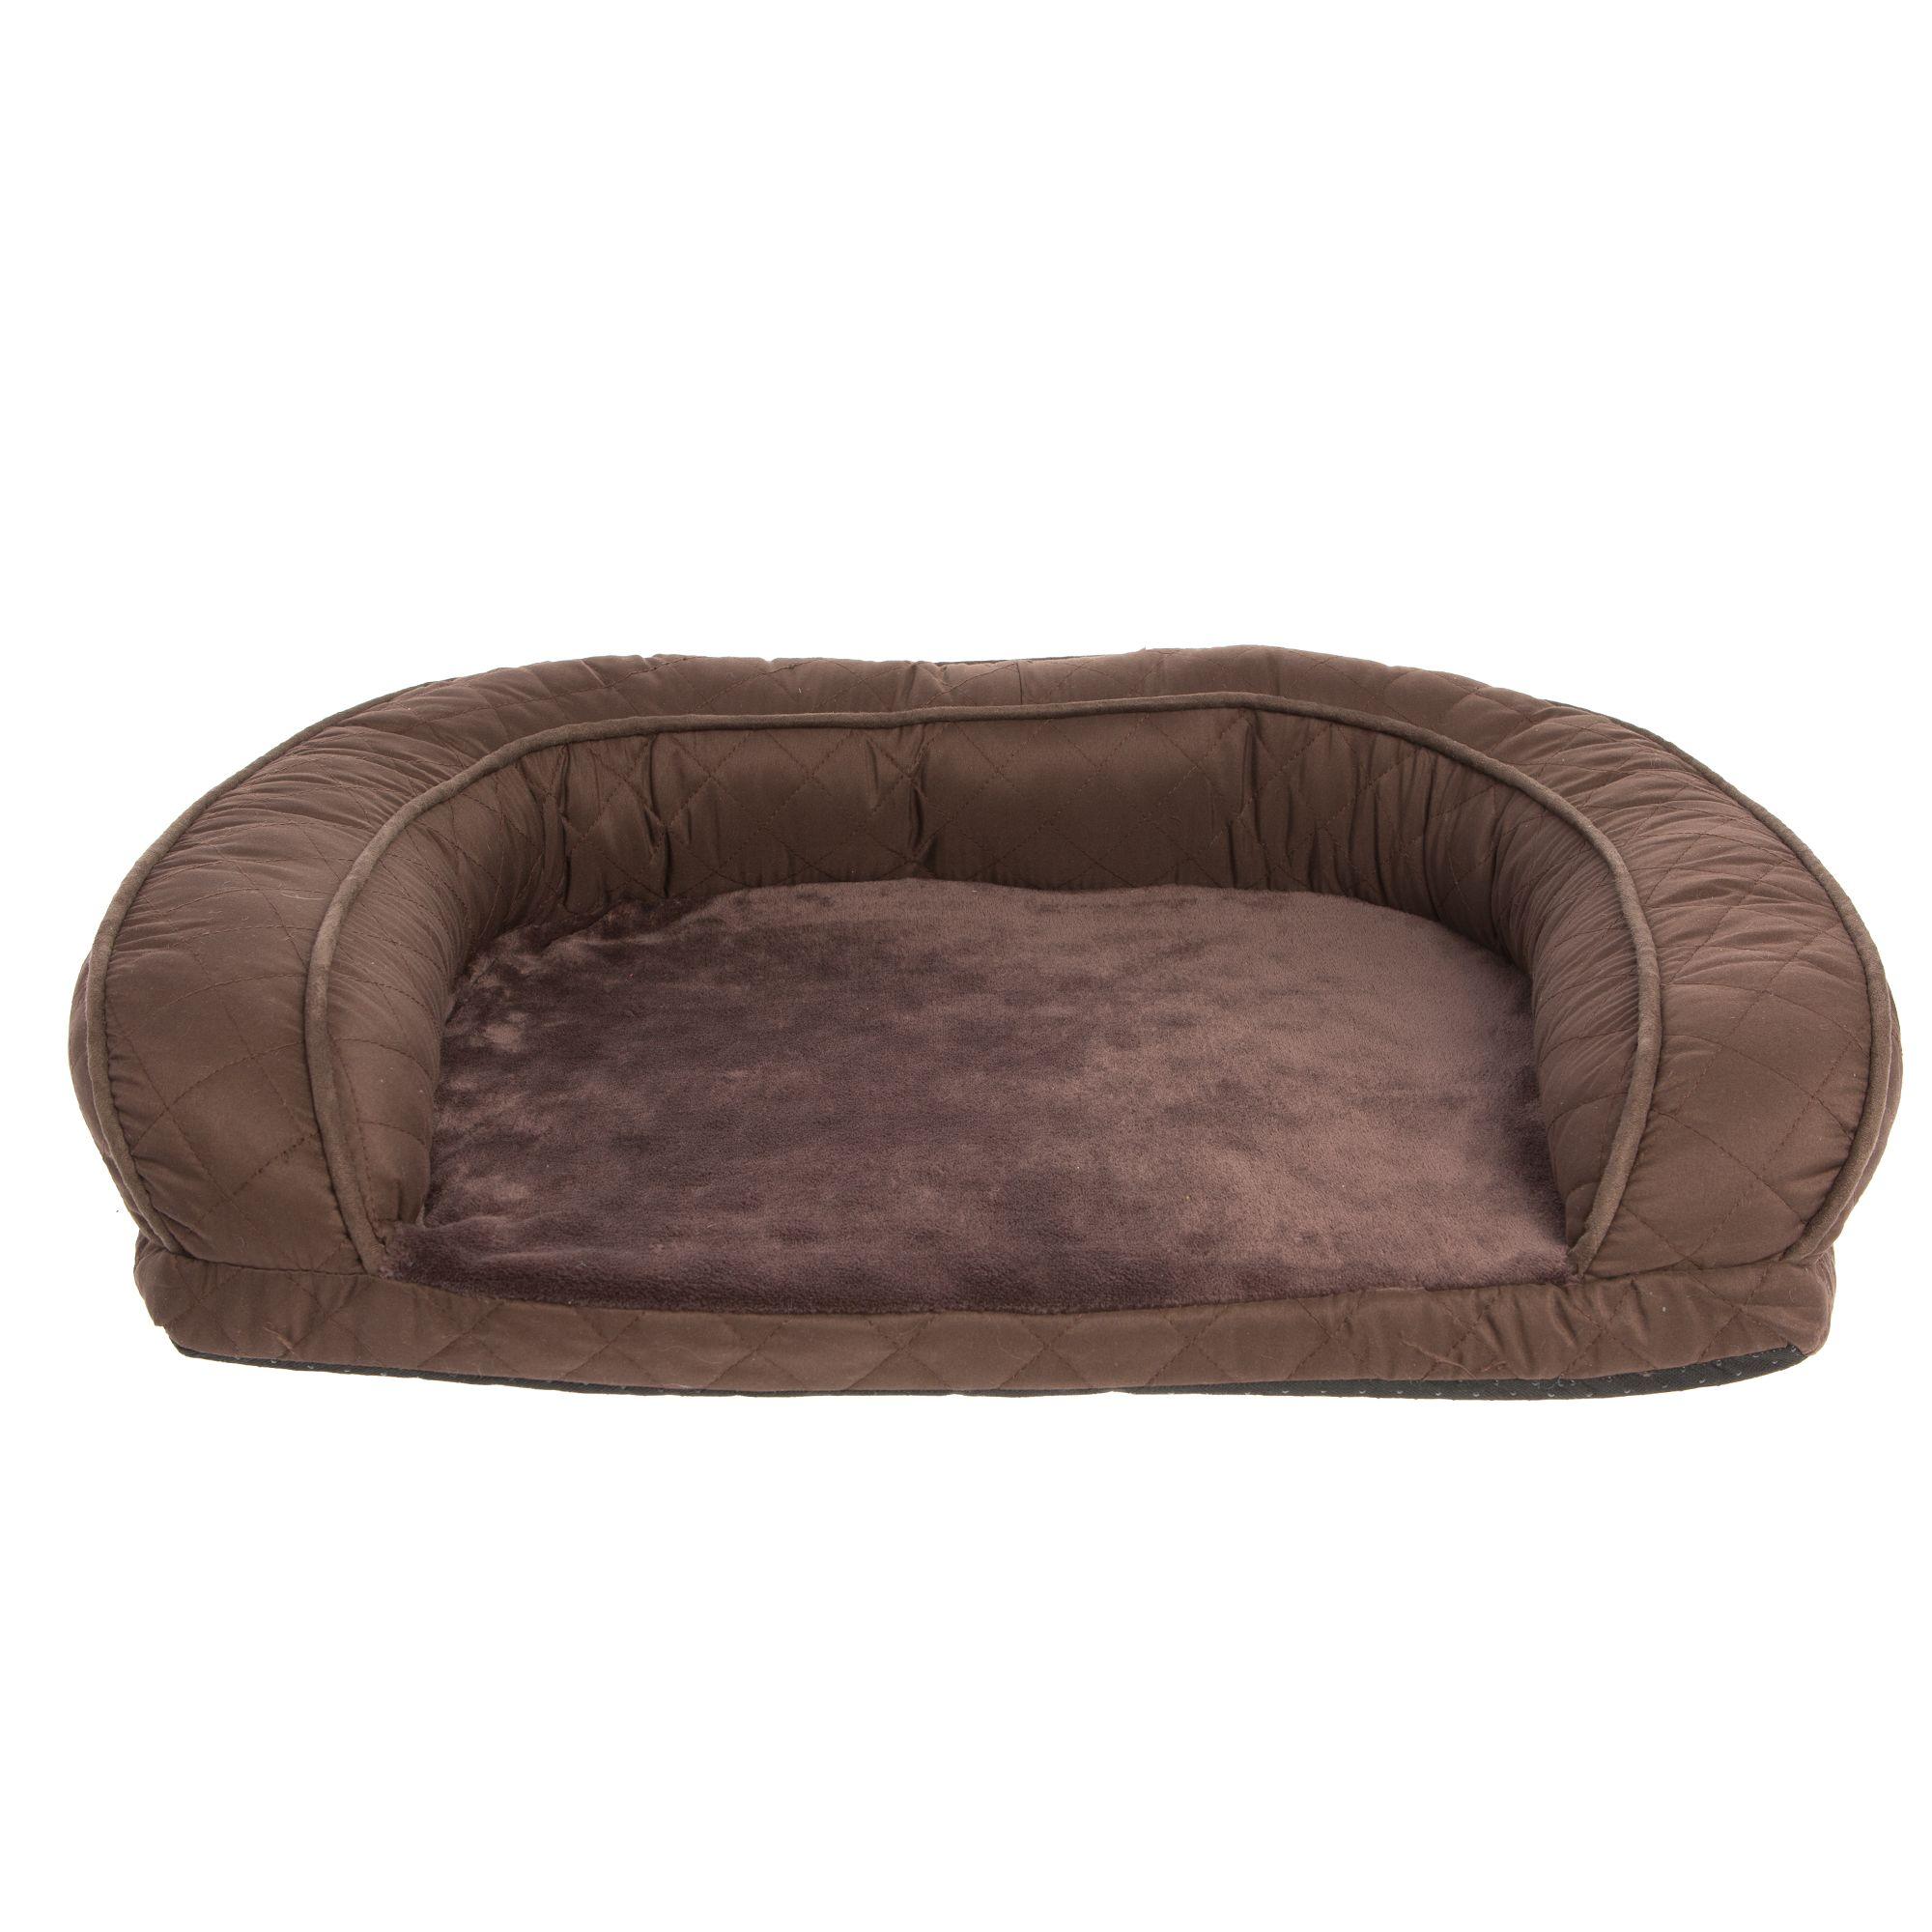 Top Paw Quilted Sofa Dog Bed dog Cuddler Beds PetSmart